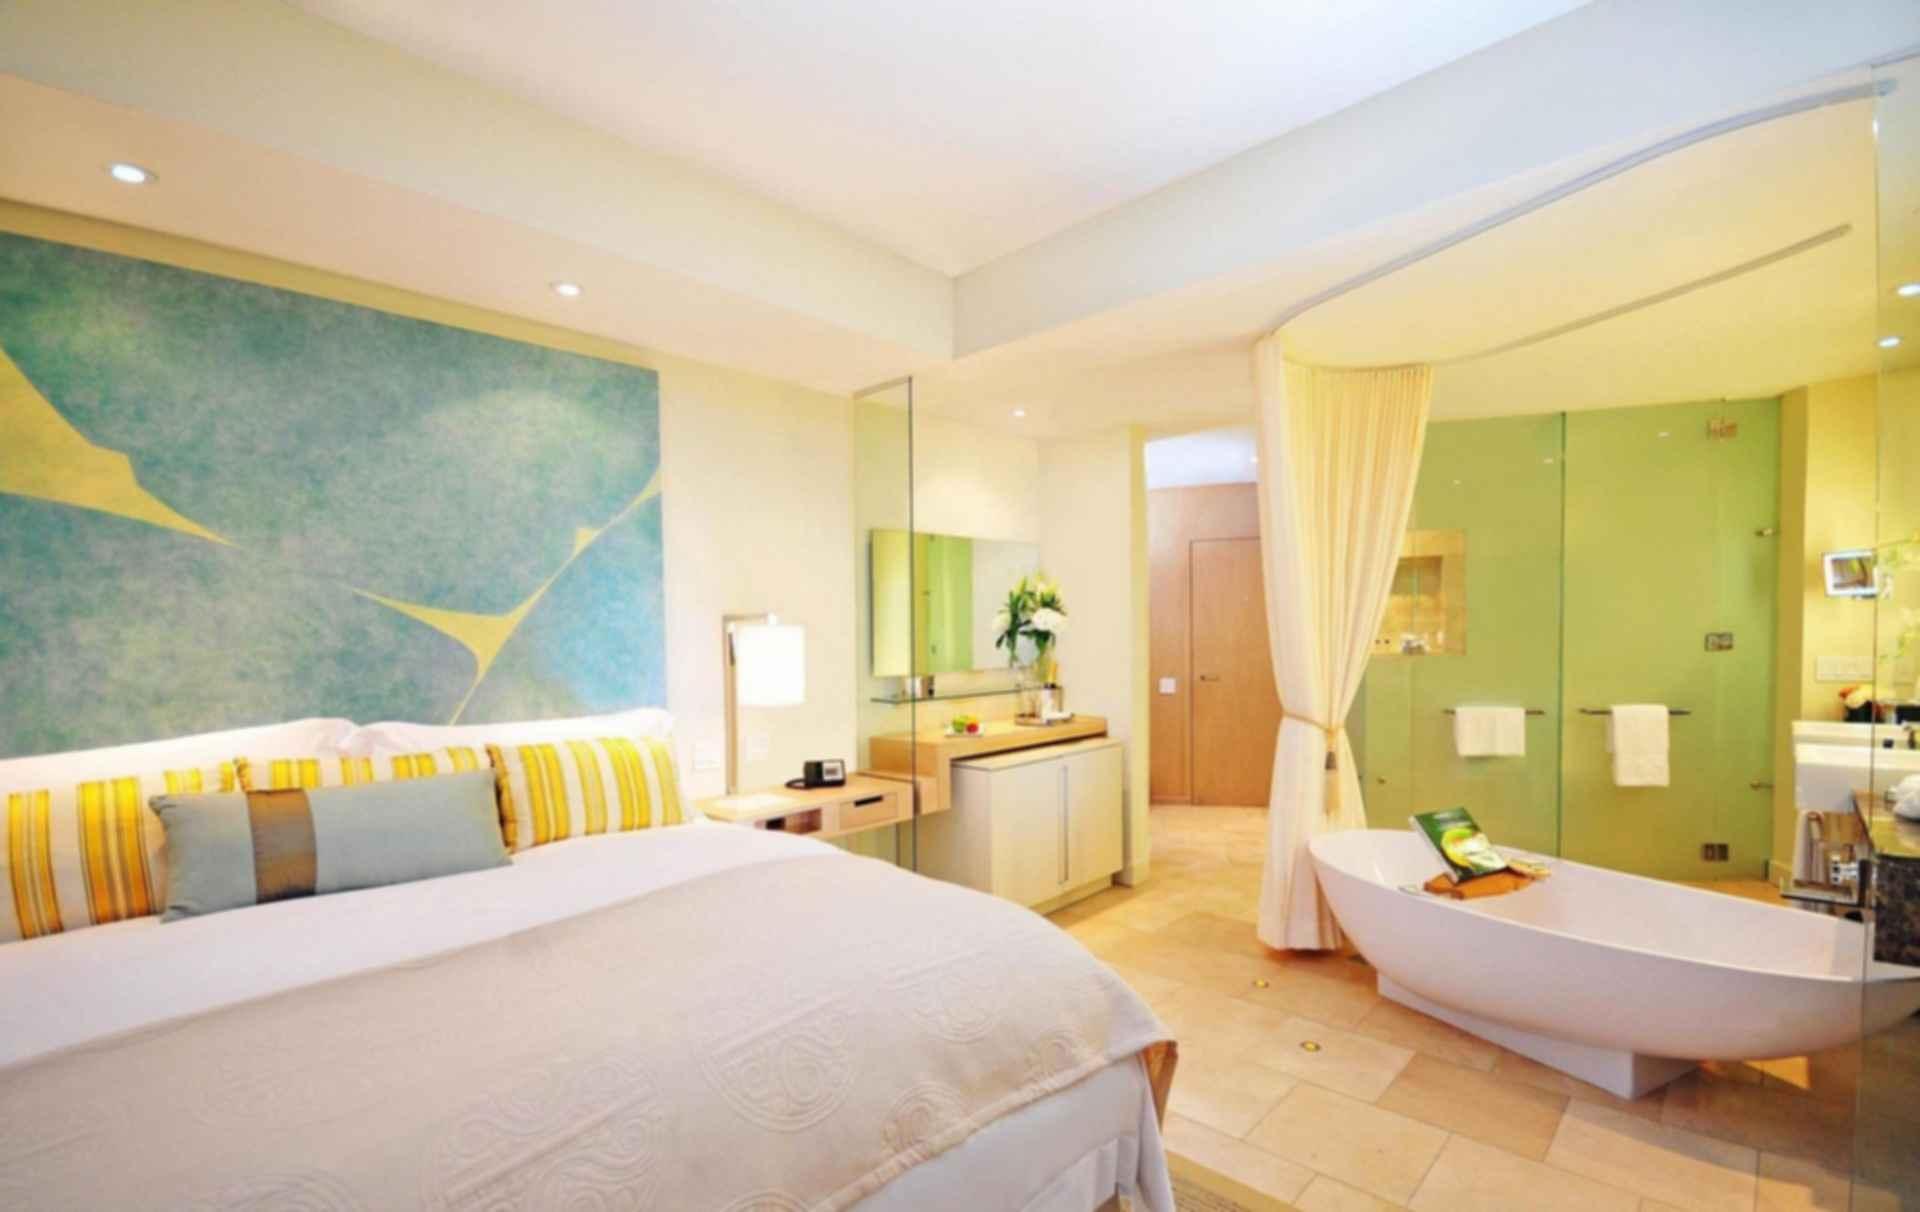 Trump Ocean Club International Hotel and Tower, Panama - Interior/Bathroom/Bedroom